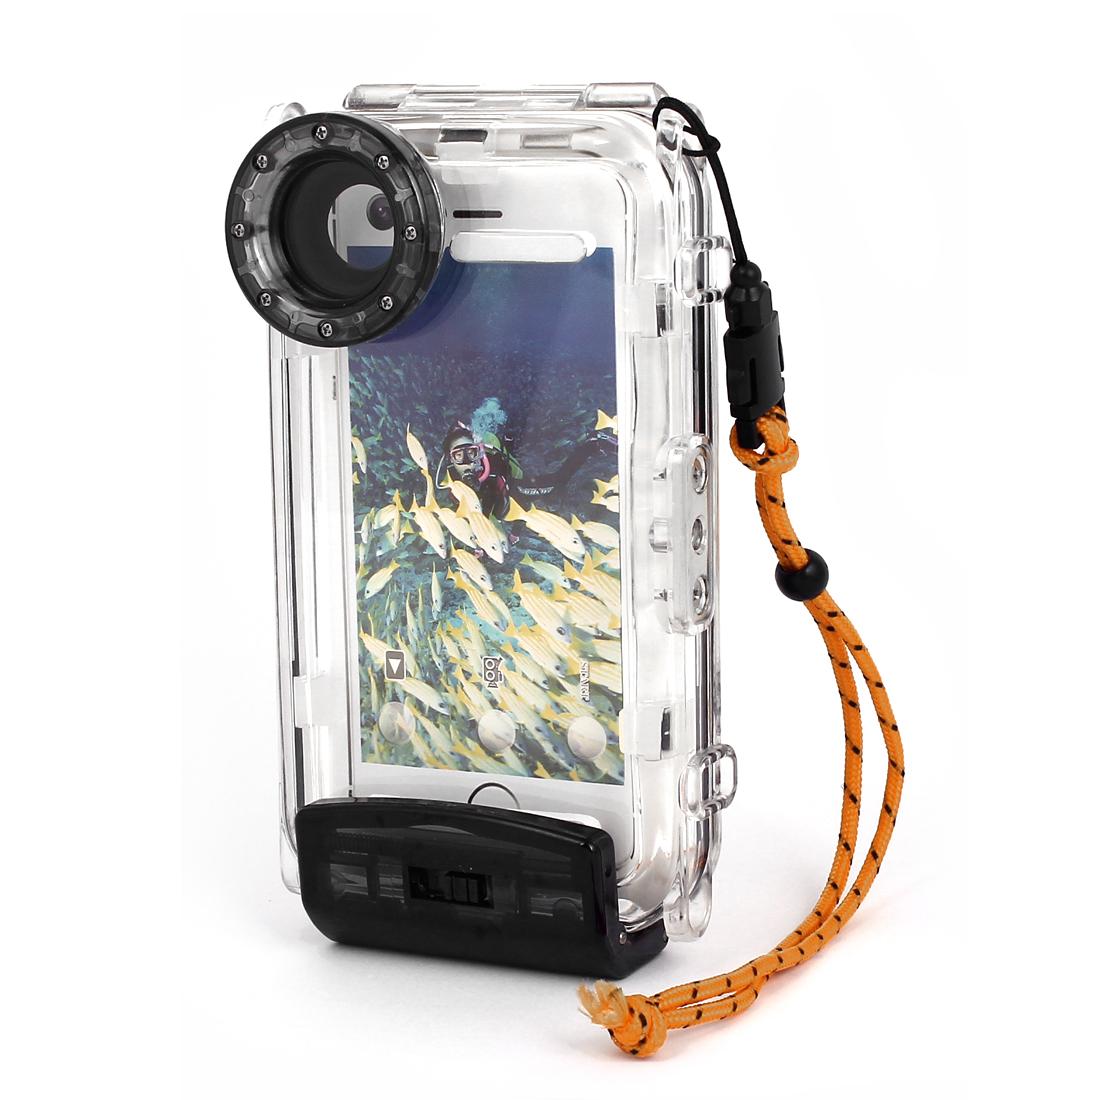 Waterproof Photo Housing Underwater Case Black for iPhone 5/5s/5c